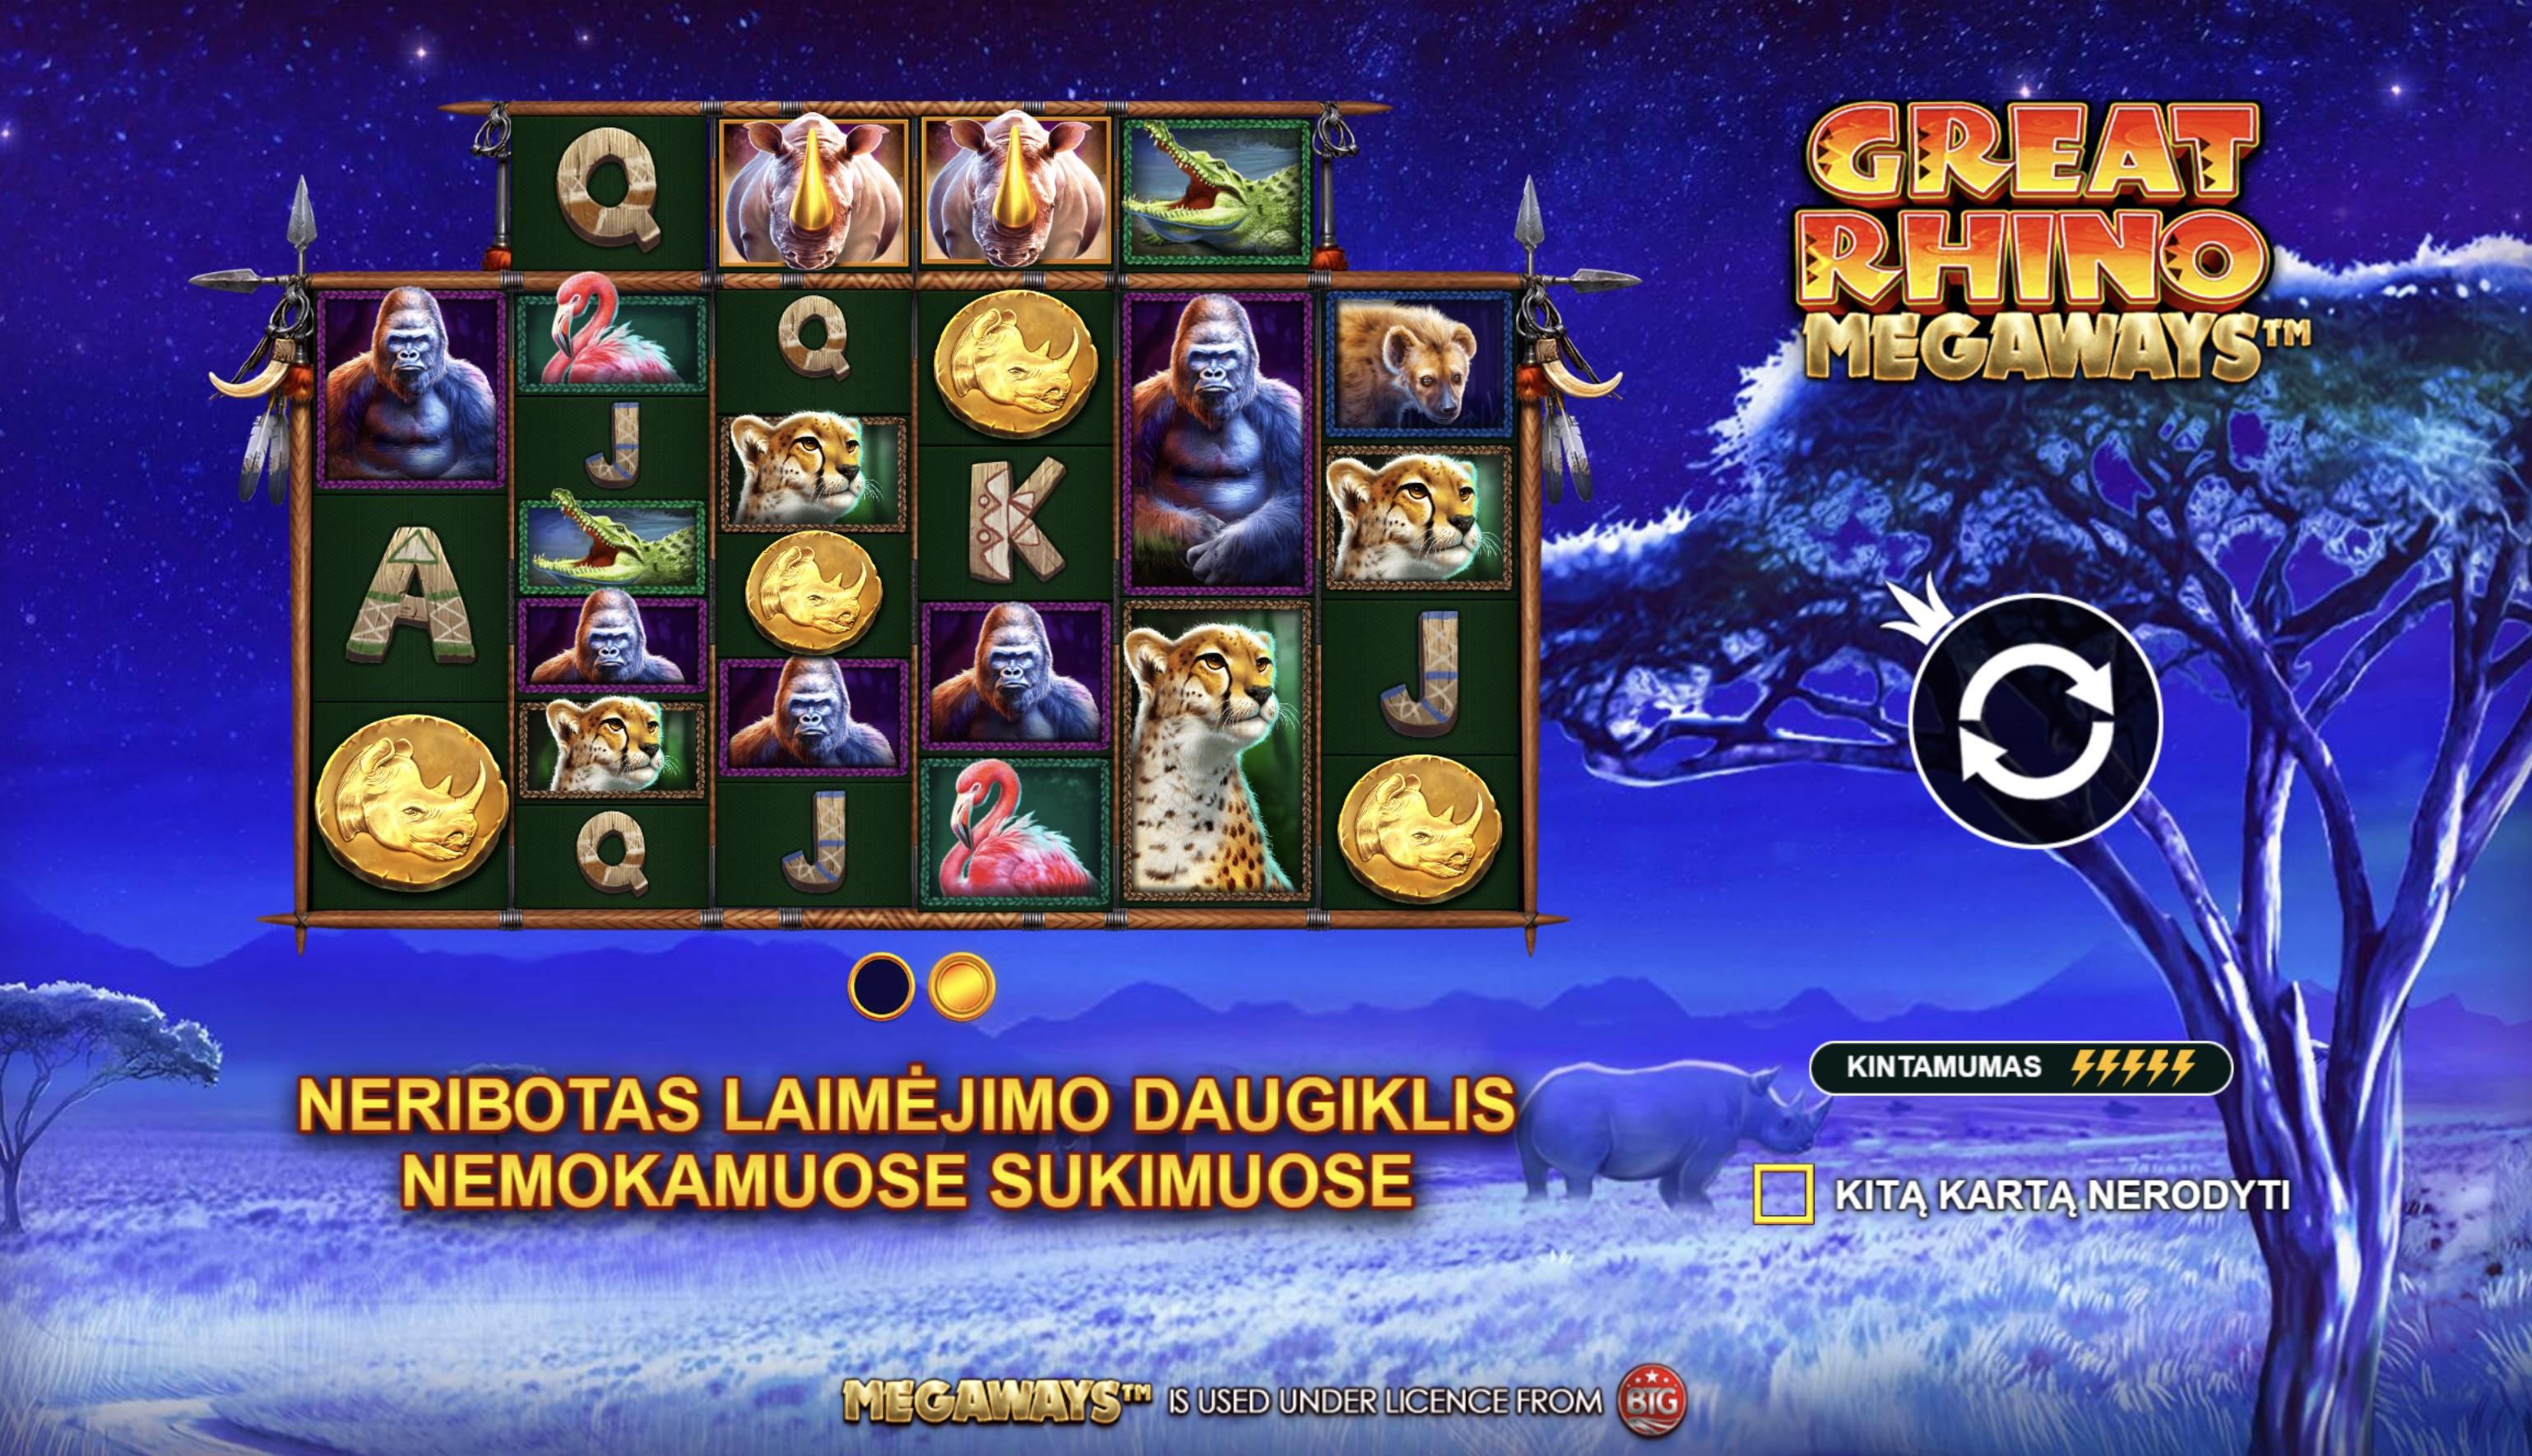 great rhino megaways slot demo real play